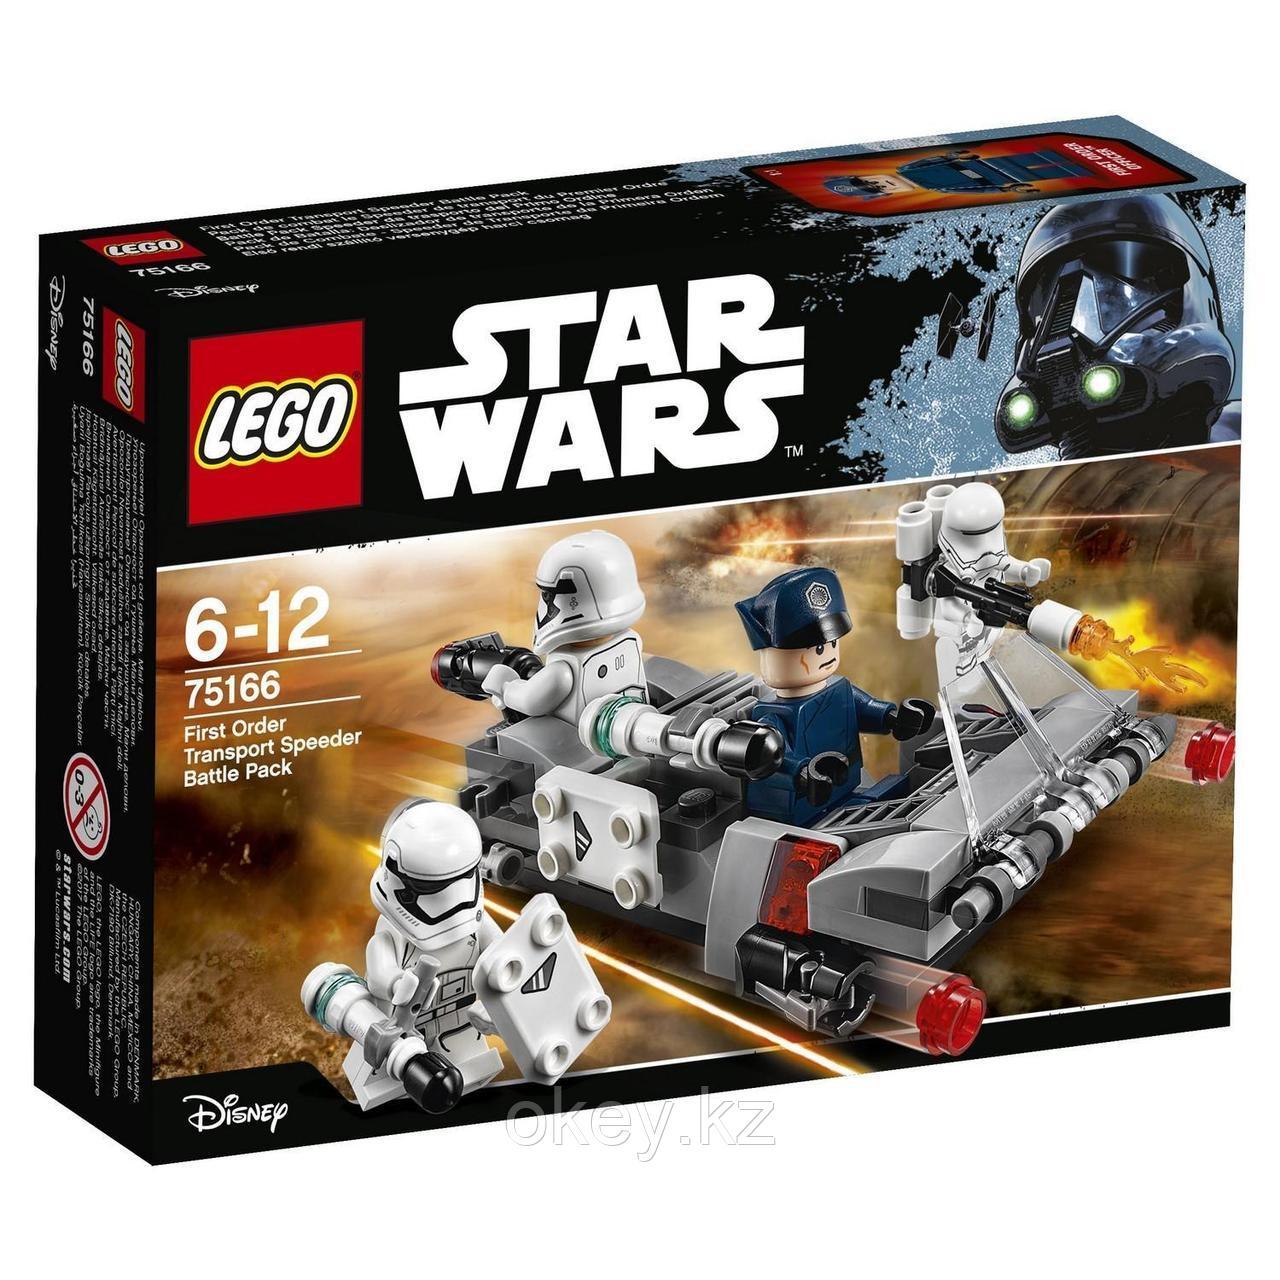 LEGO Star Wars: Спидер Первого ордена 75166